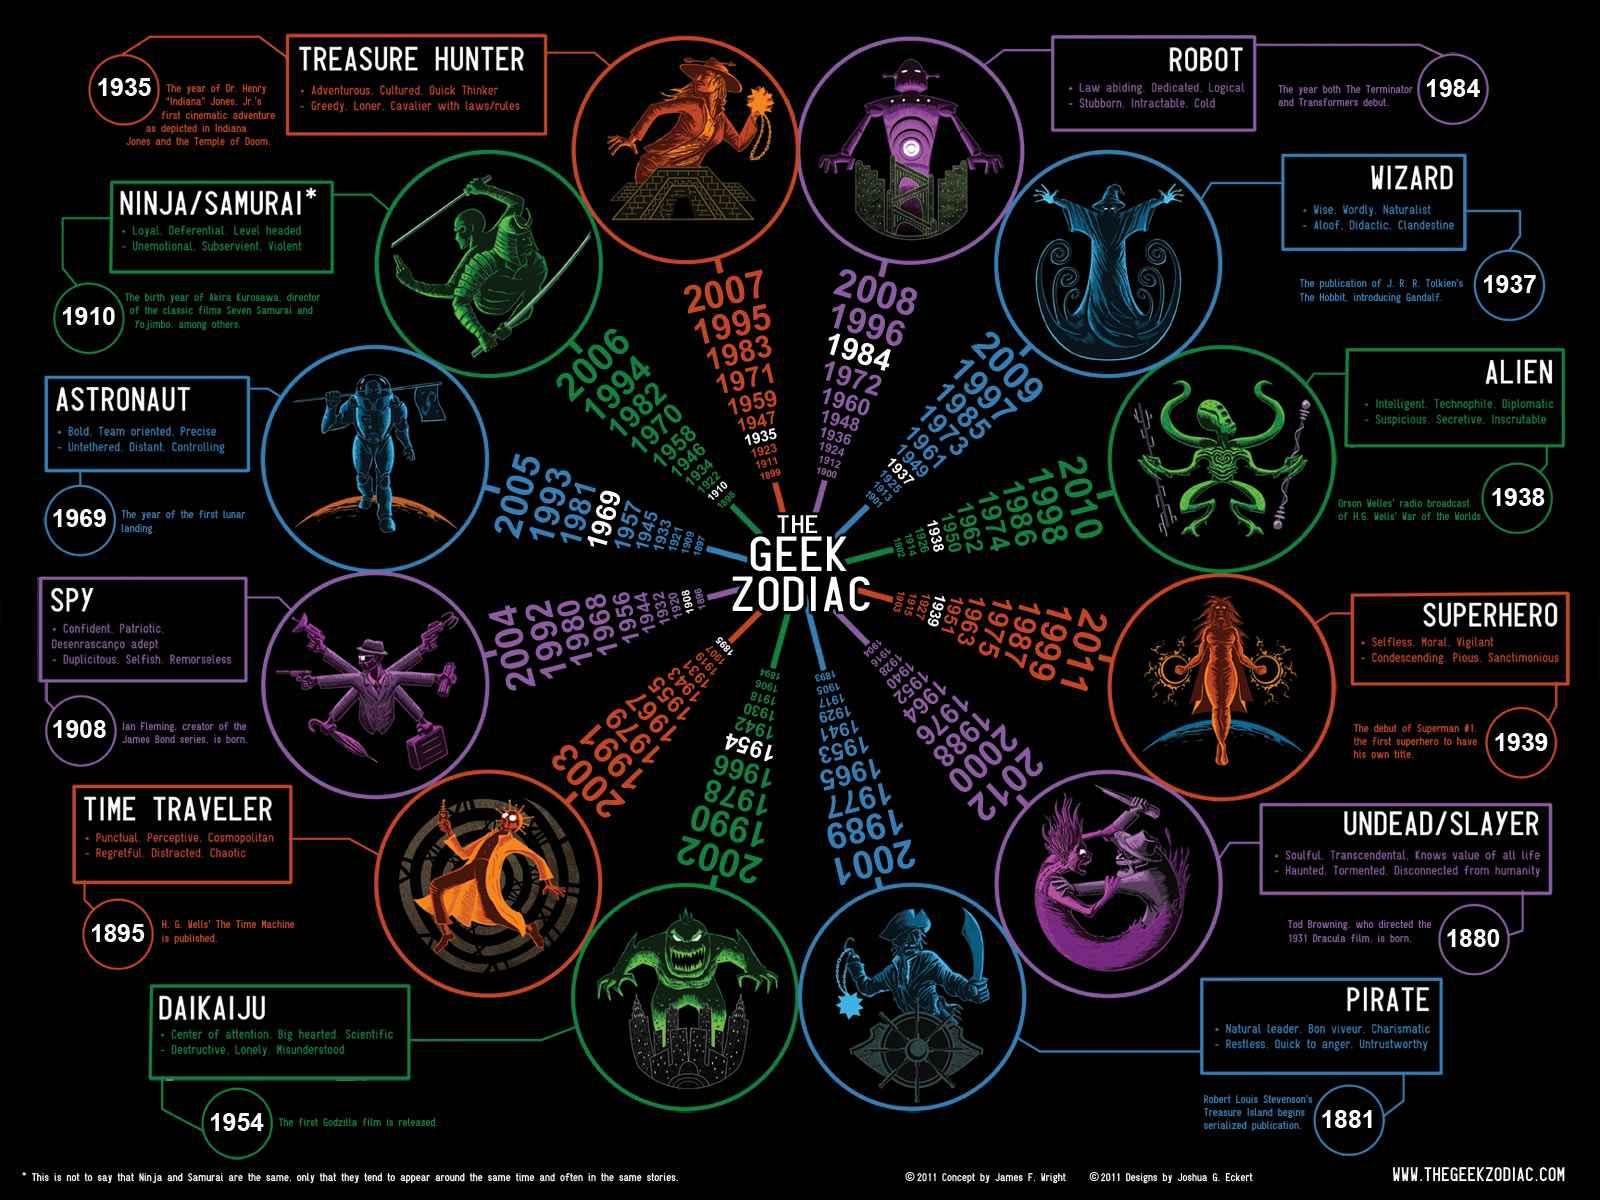 [jeu] Les Calendriers déglingos Geek-zodiac-by-james-f-wright-and-joshua-g-eckert